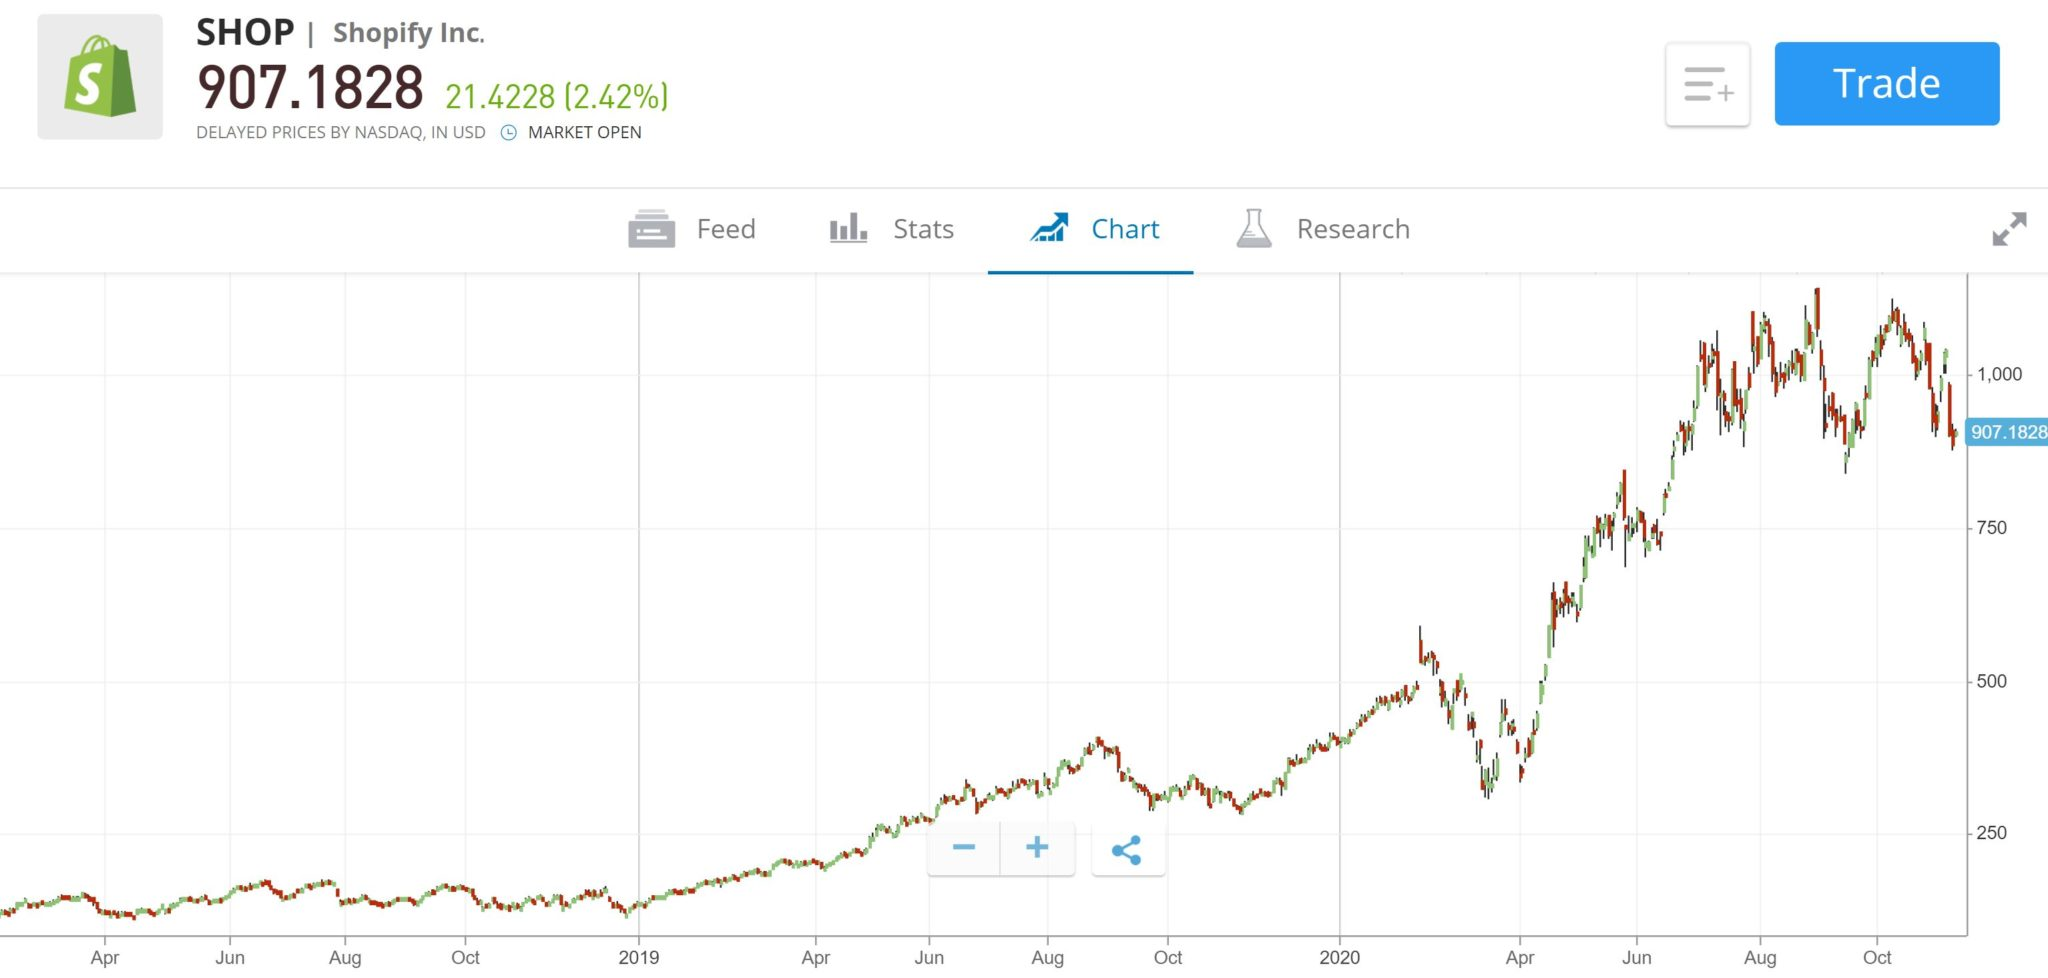 Shopify Stock Price Chart eToro